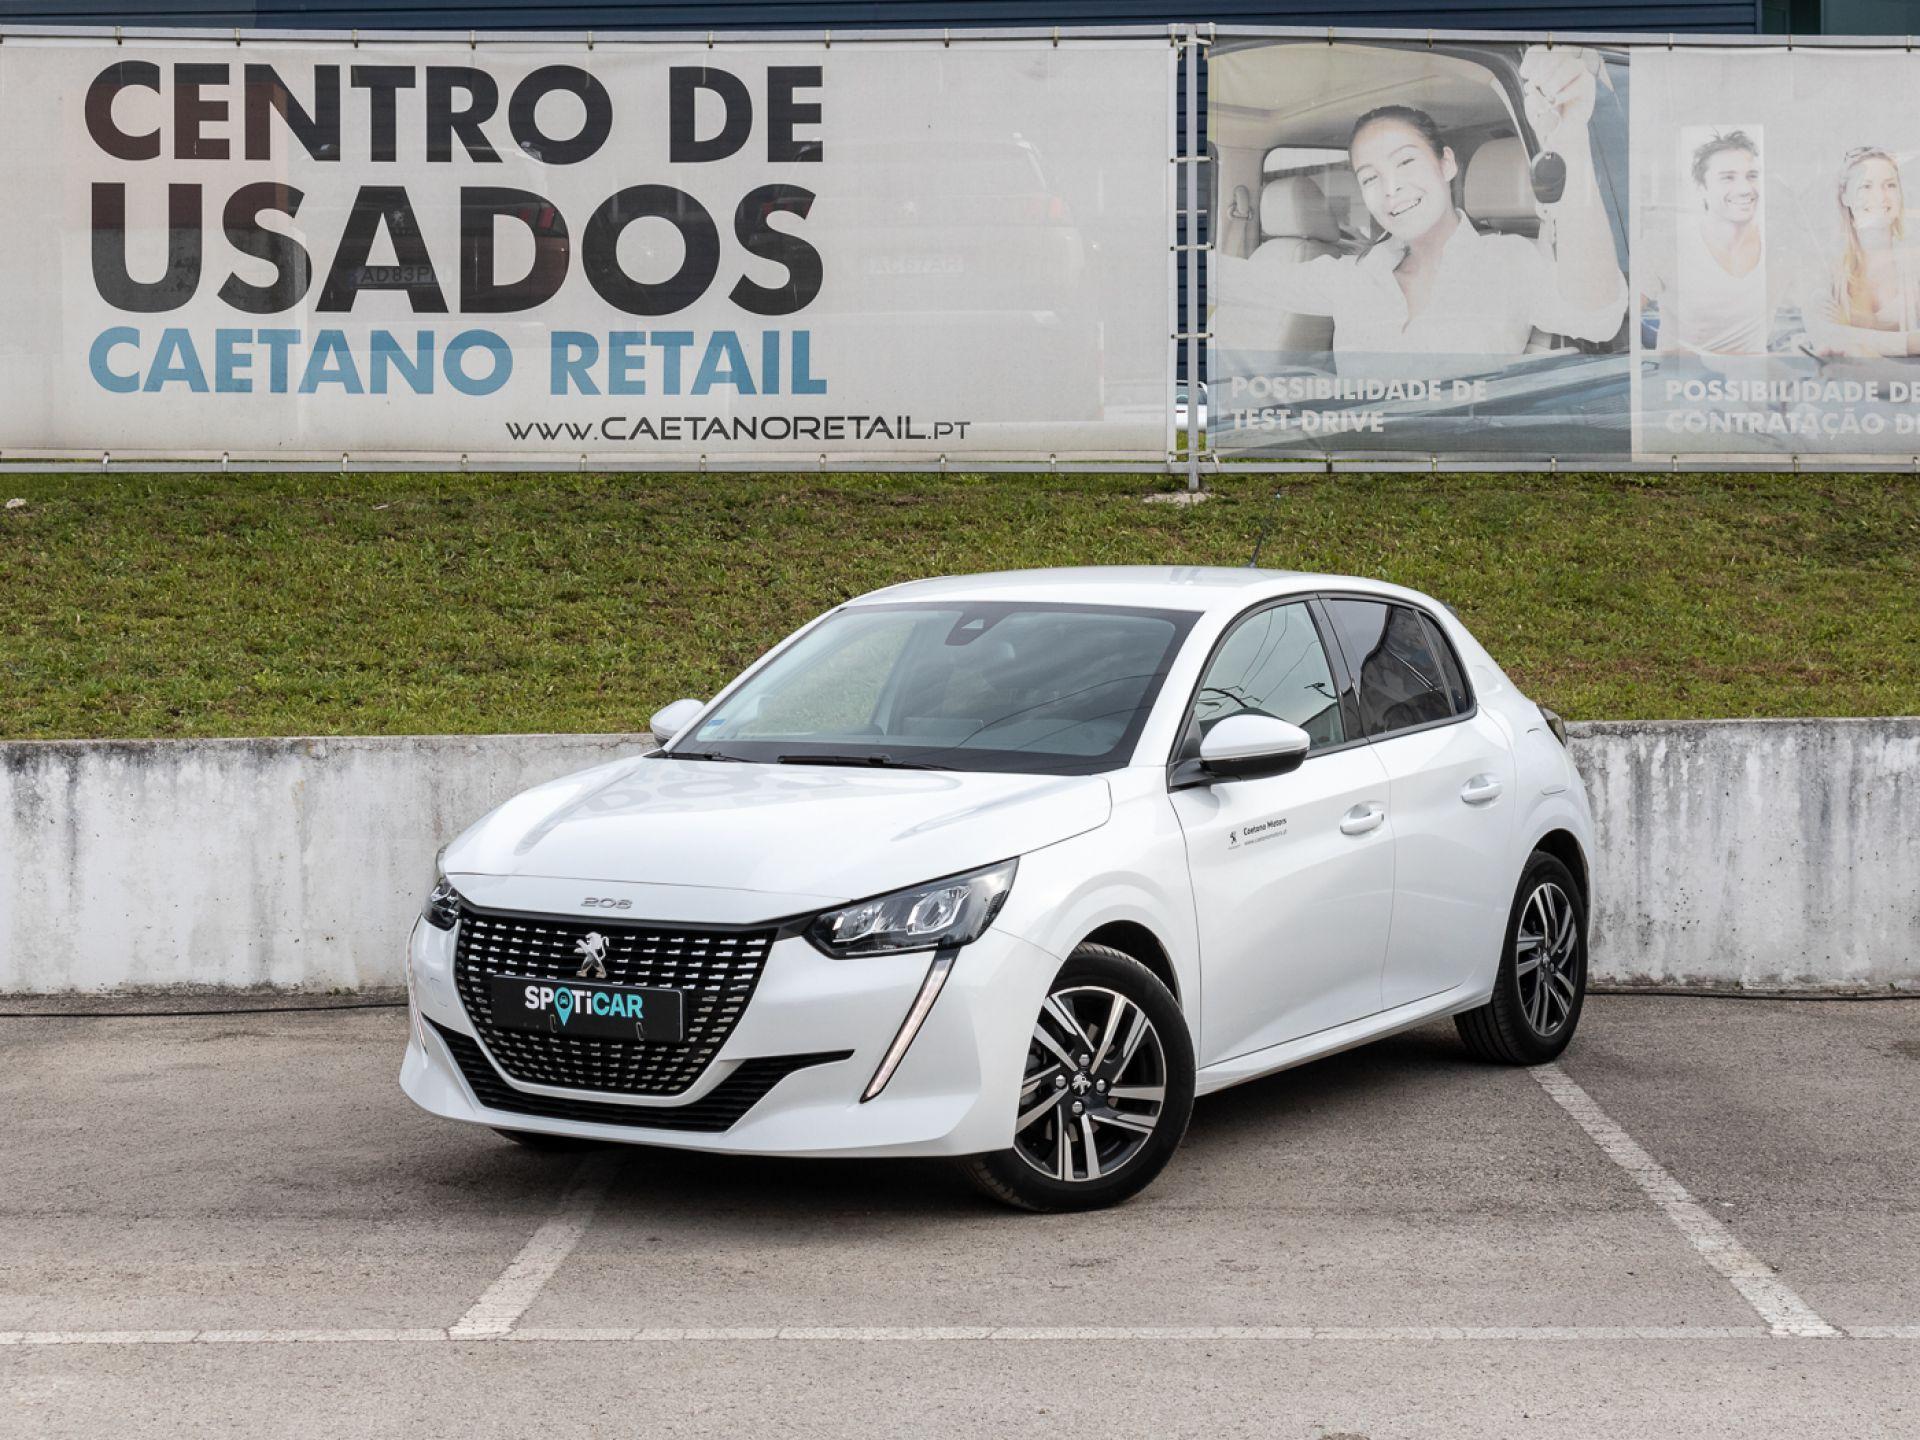 Peugeot 208 1.2 PureTech 100cv Allure segunda mão Setúbal